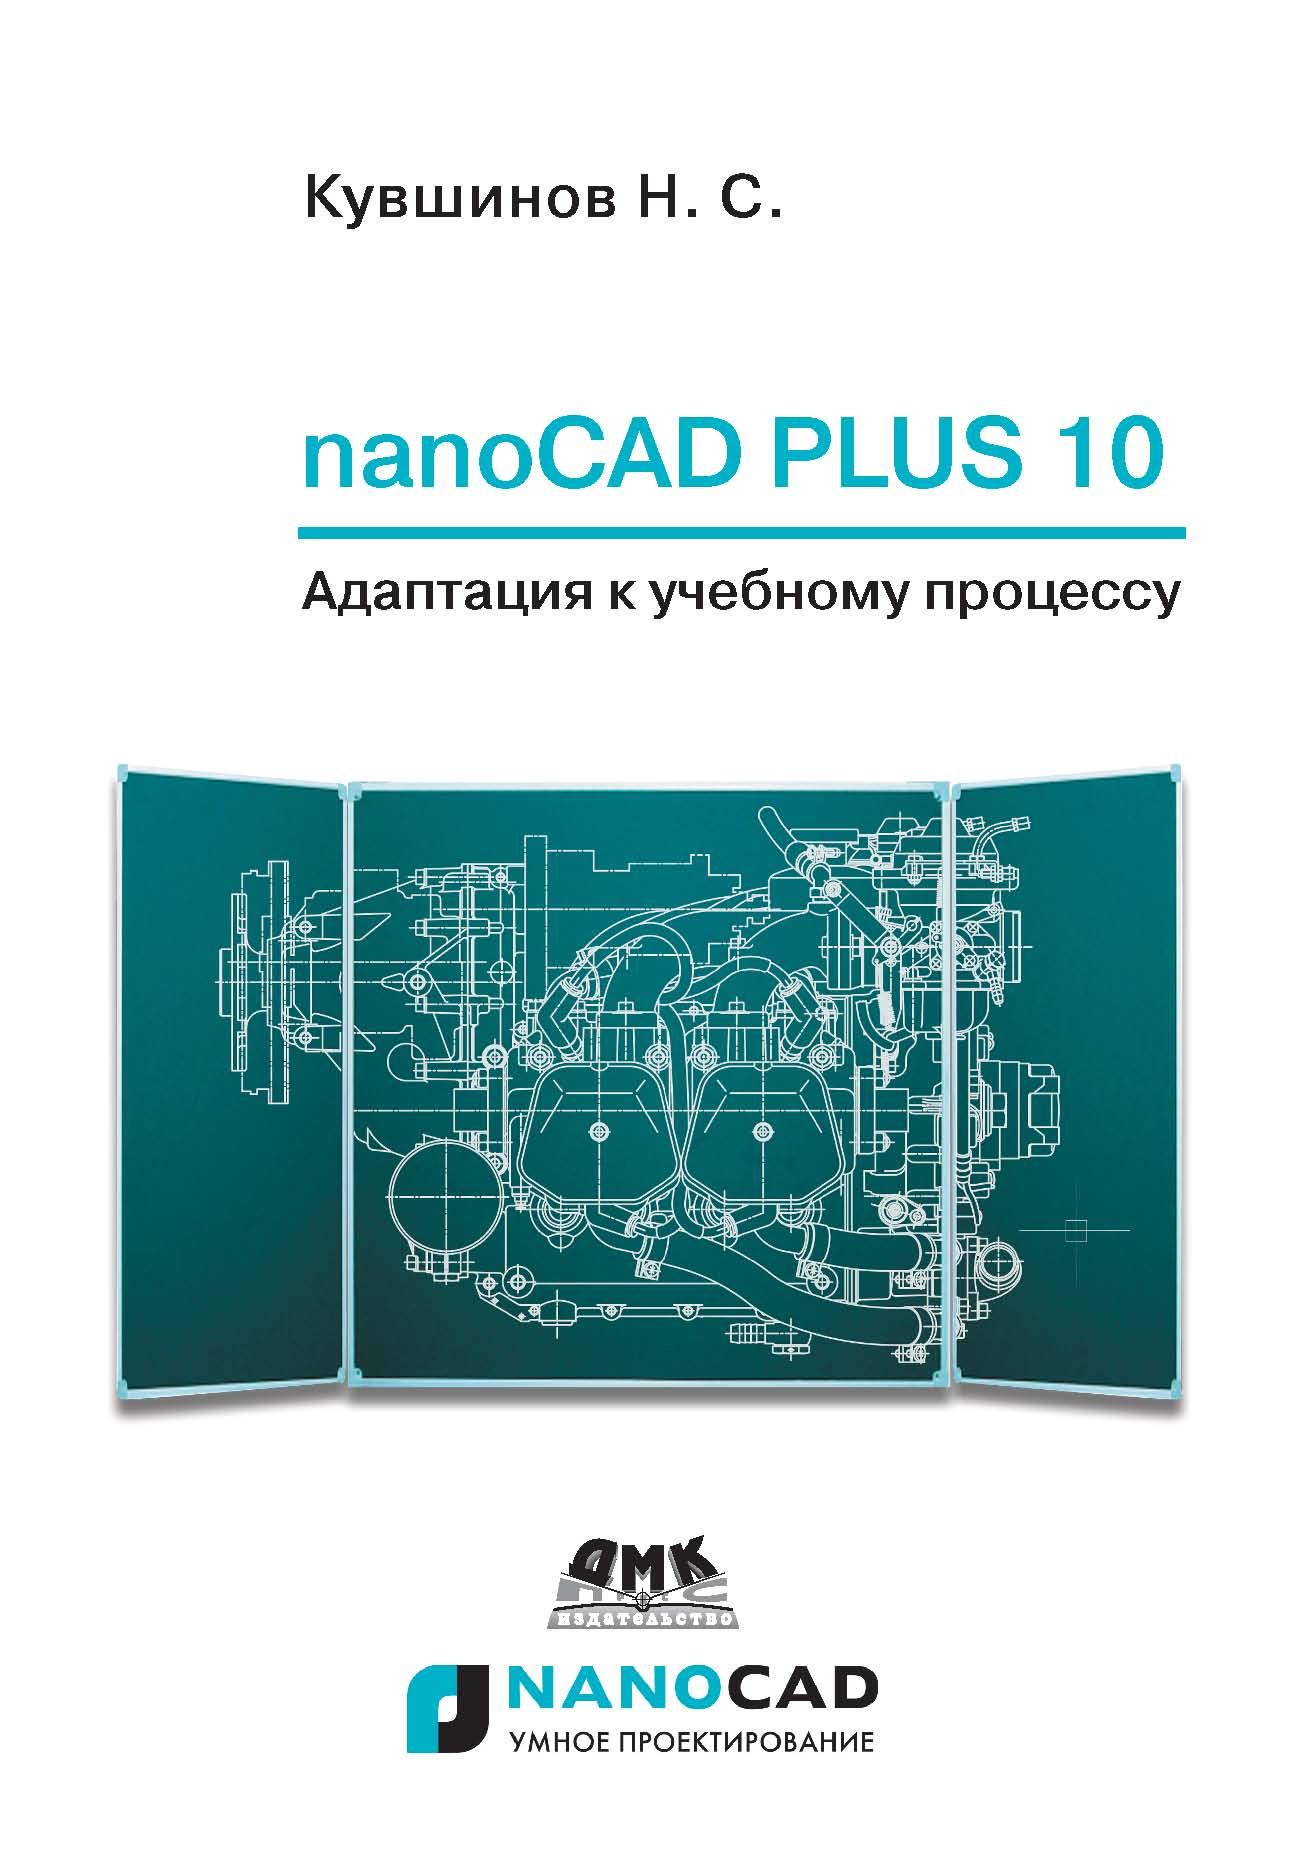 nanoCAD Plus 10. Адаптация к учебному процессу